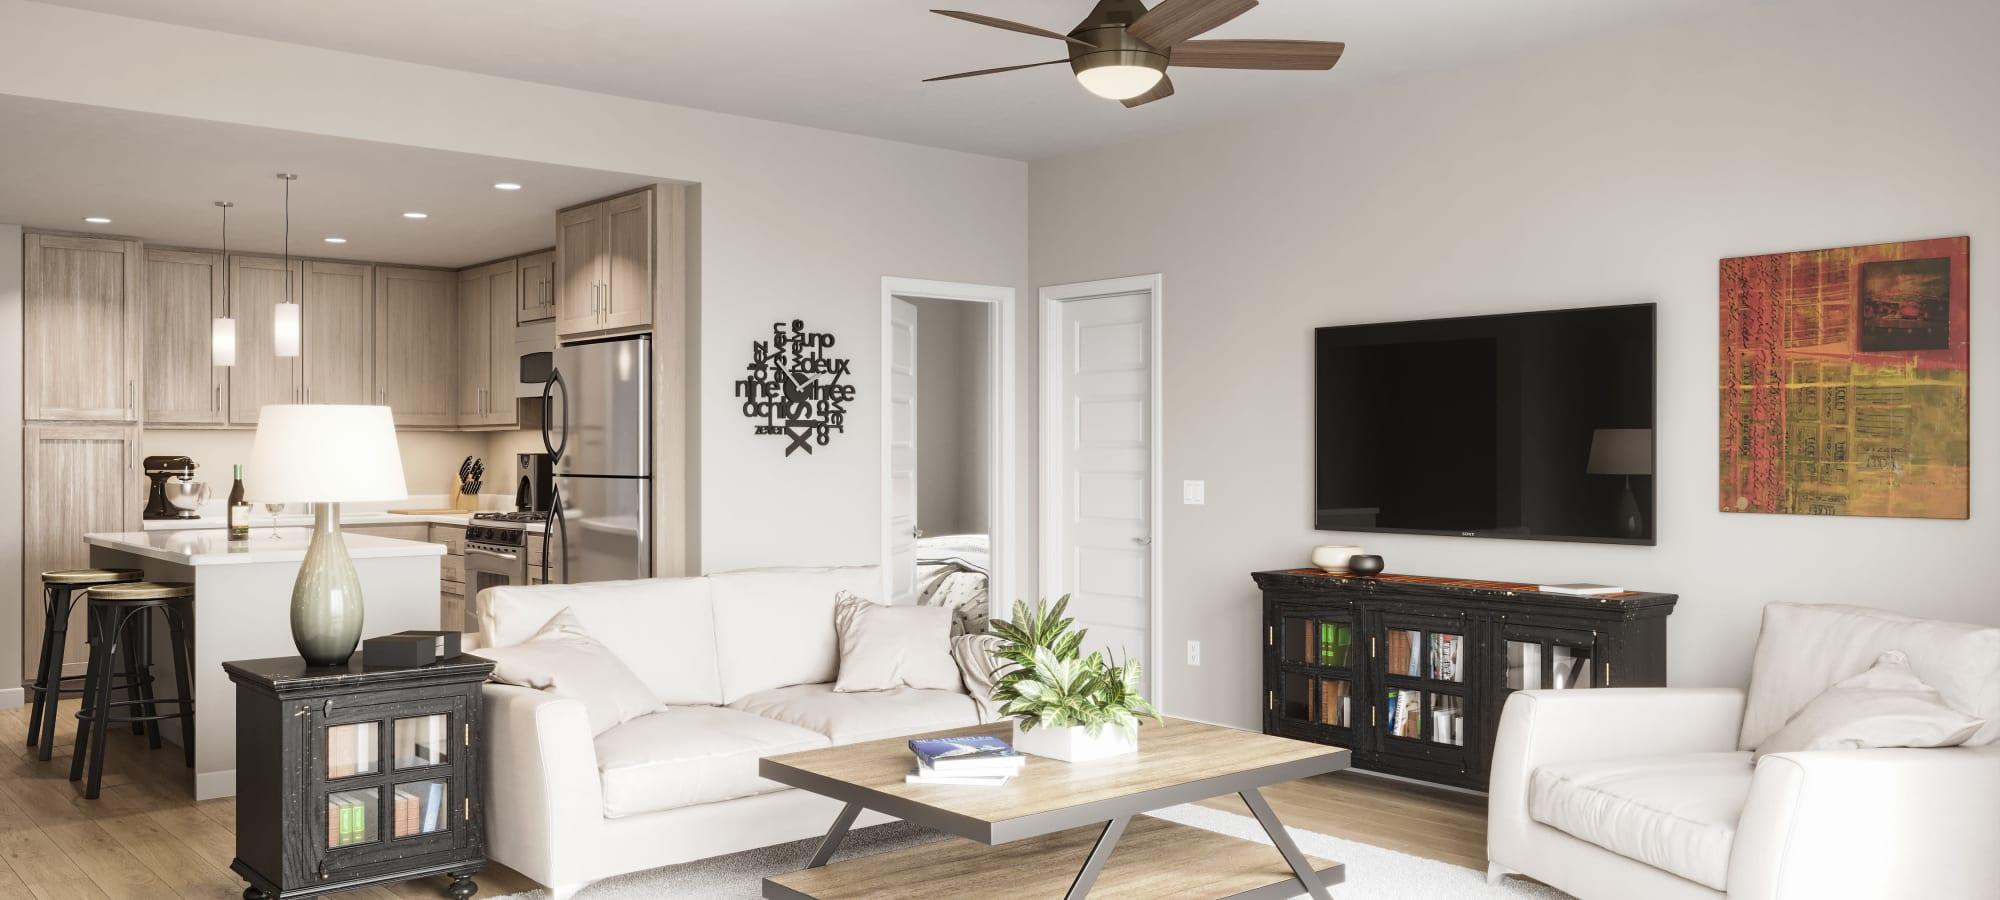 In unit view of kitchen & living room at Estia Surprise Farms in Surprise, Arizona